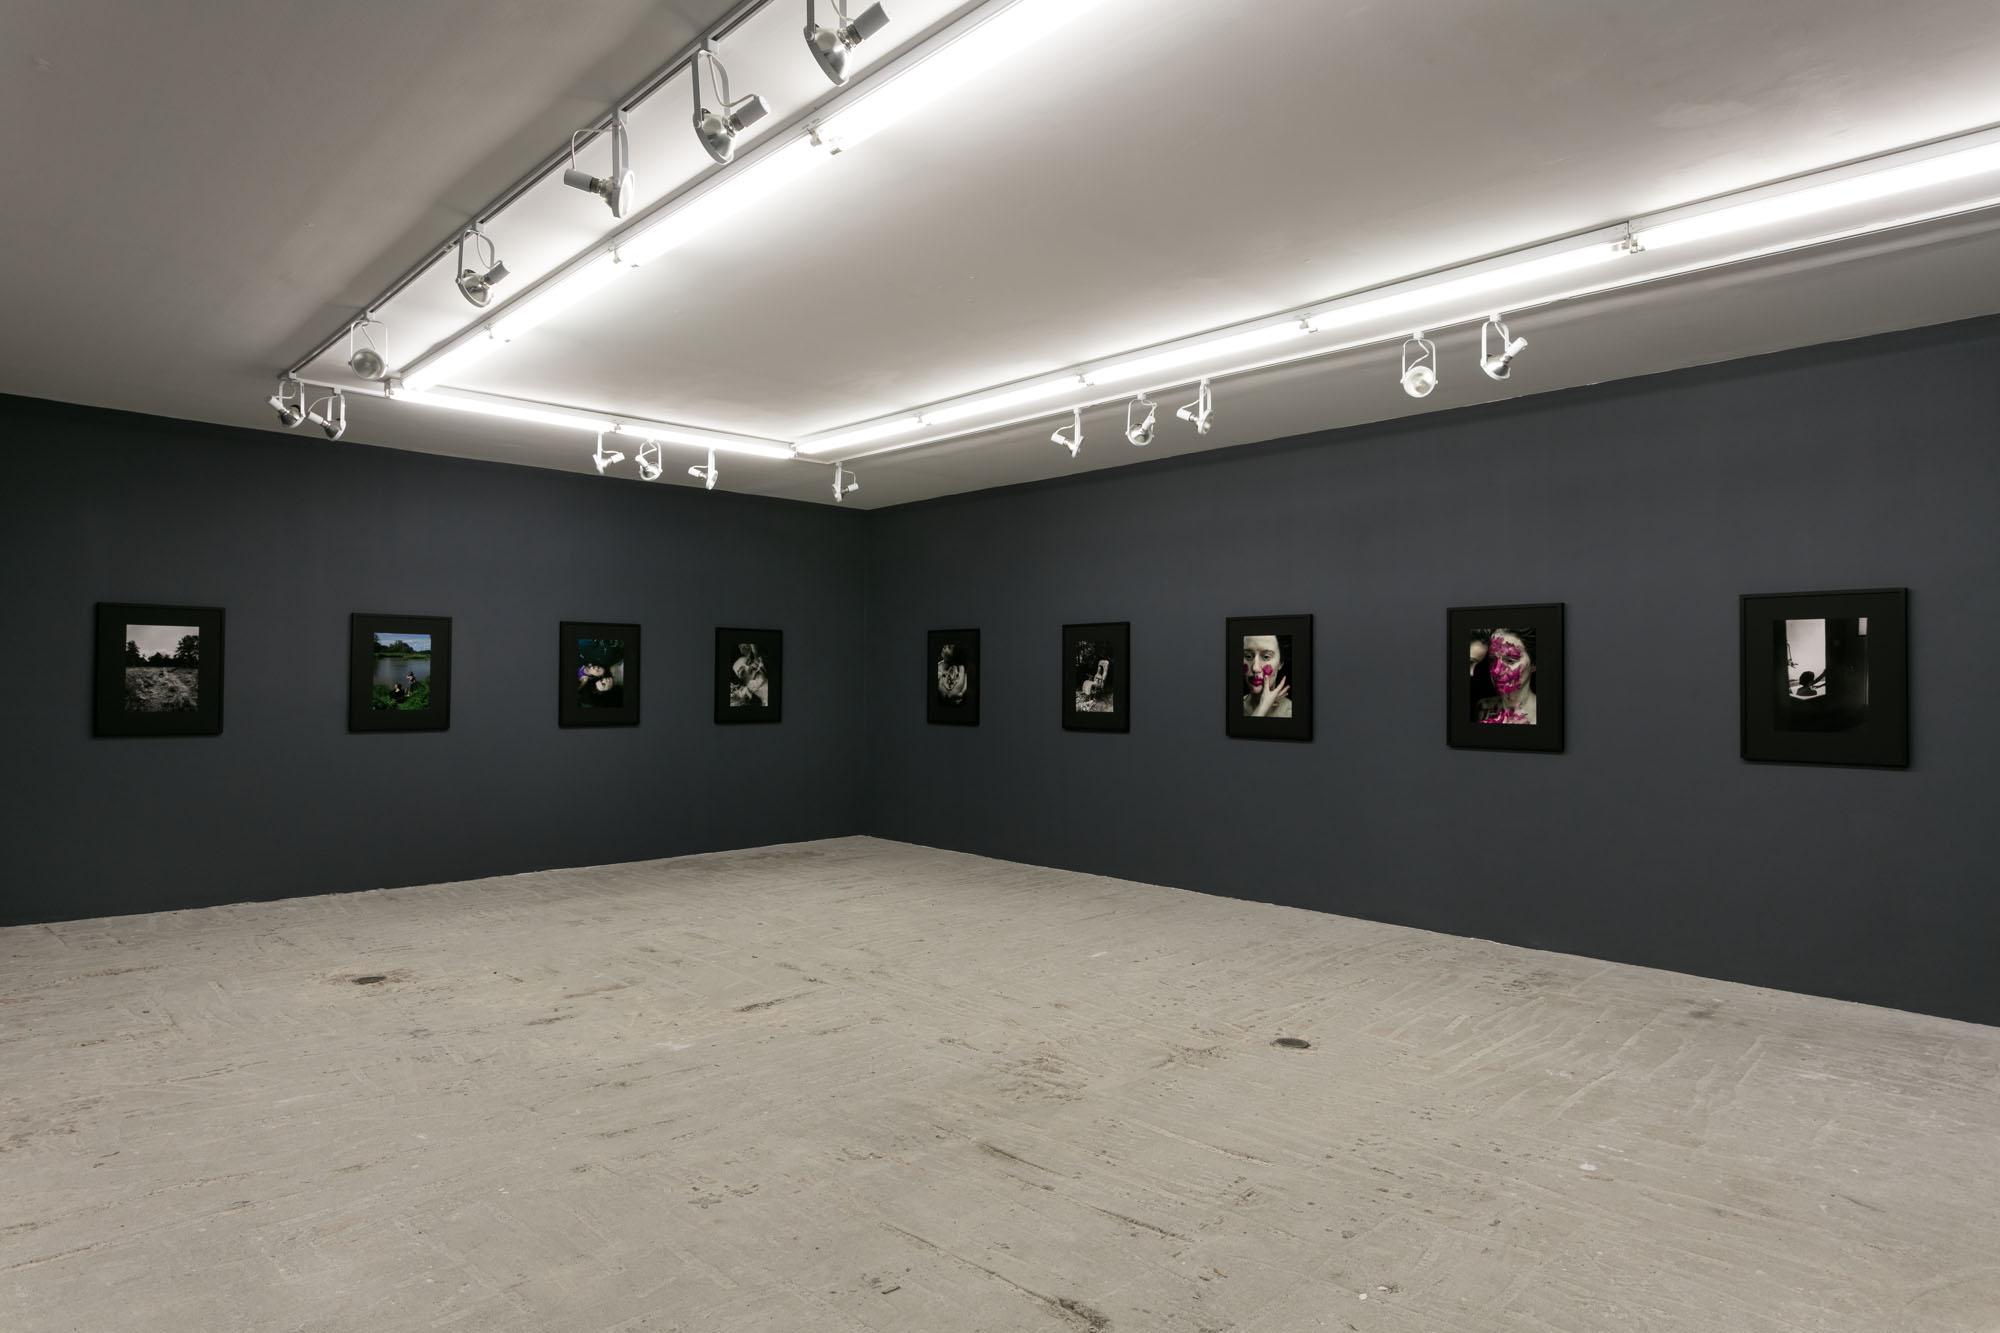 Aneta Grzeszykowska,  Mama,  Installation view at Lyles & King, October 14 - November 18, 2018